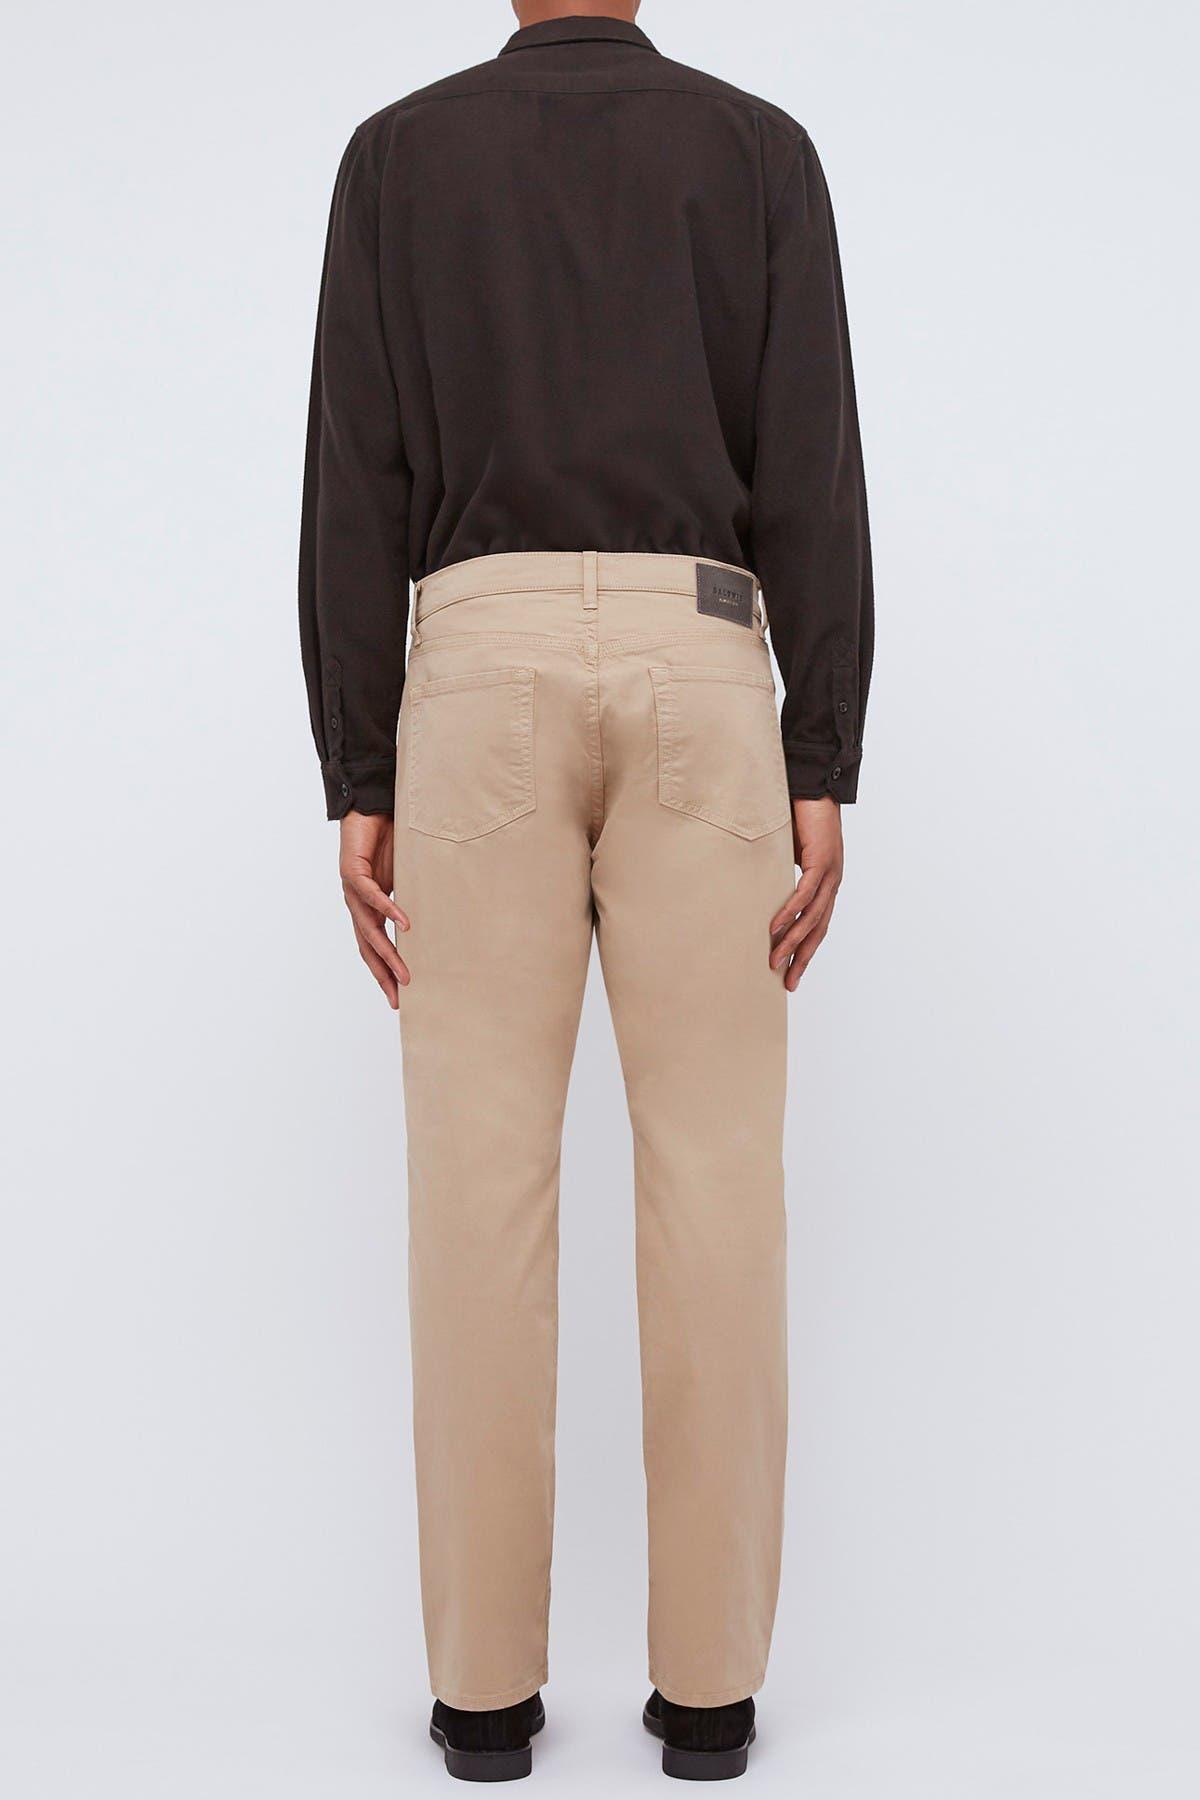 Image of BALDWIN Brennan Jeans